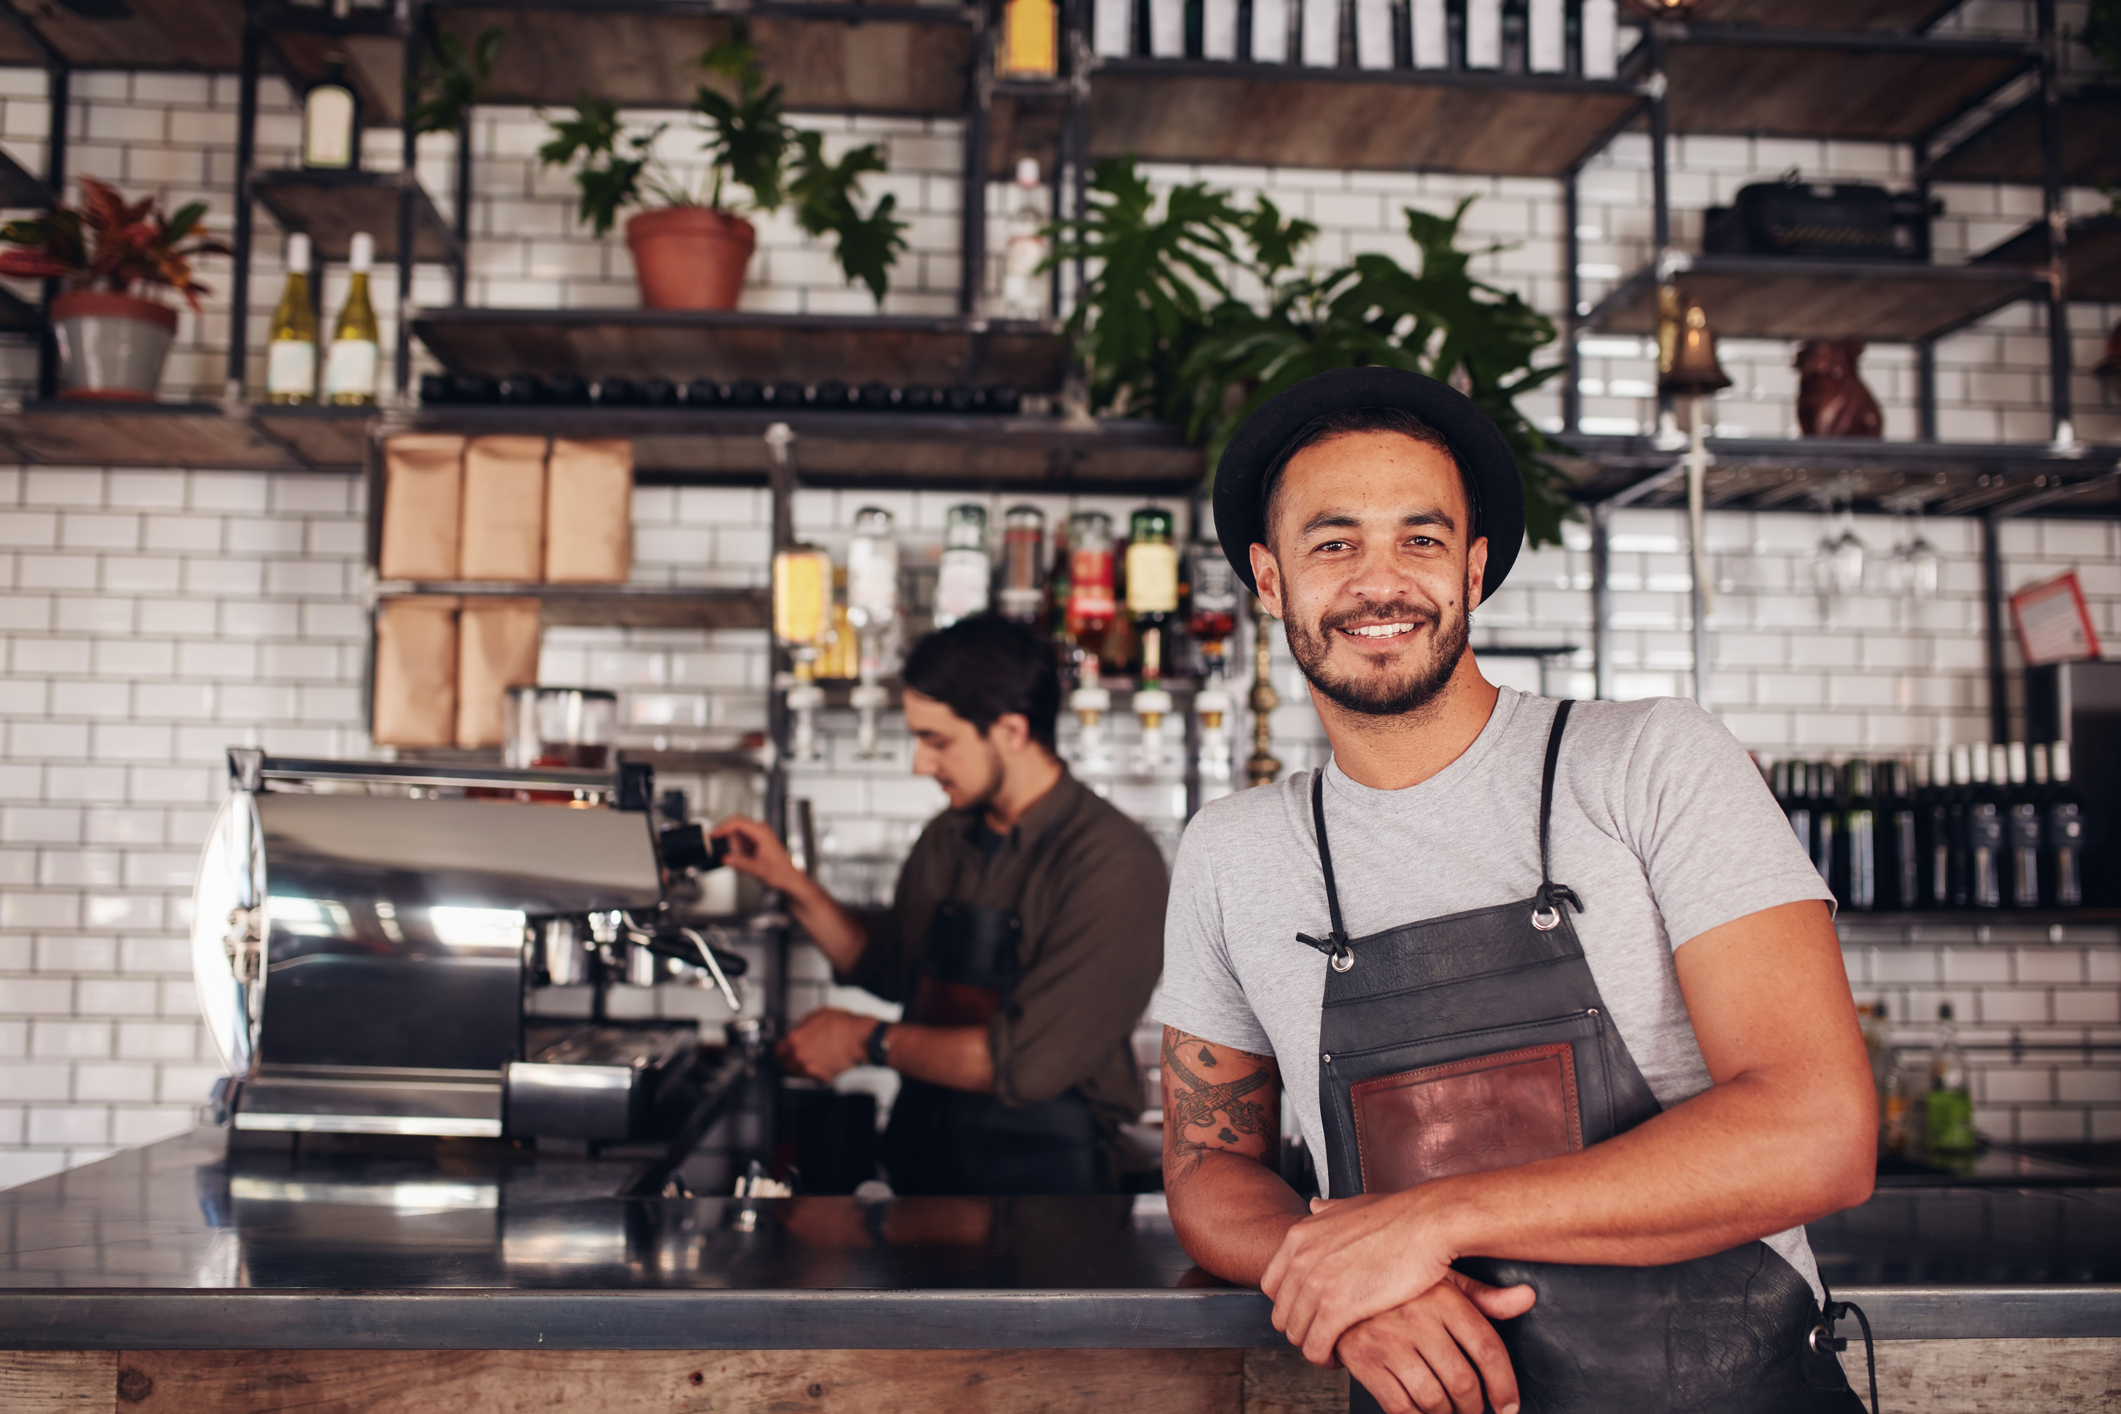 Worker power: A critical component of fair scheduling